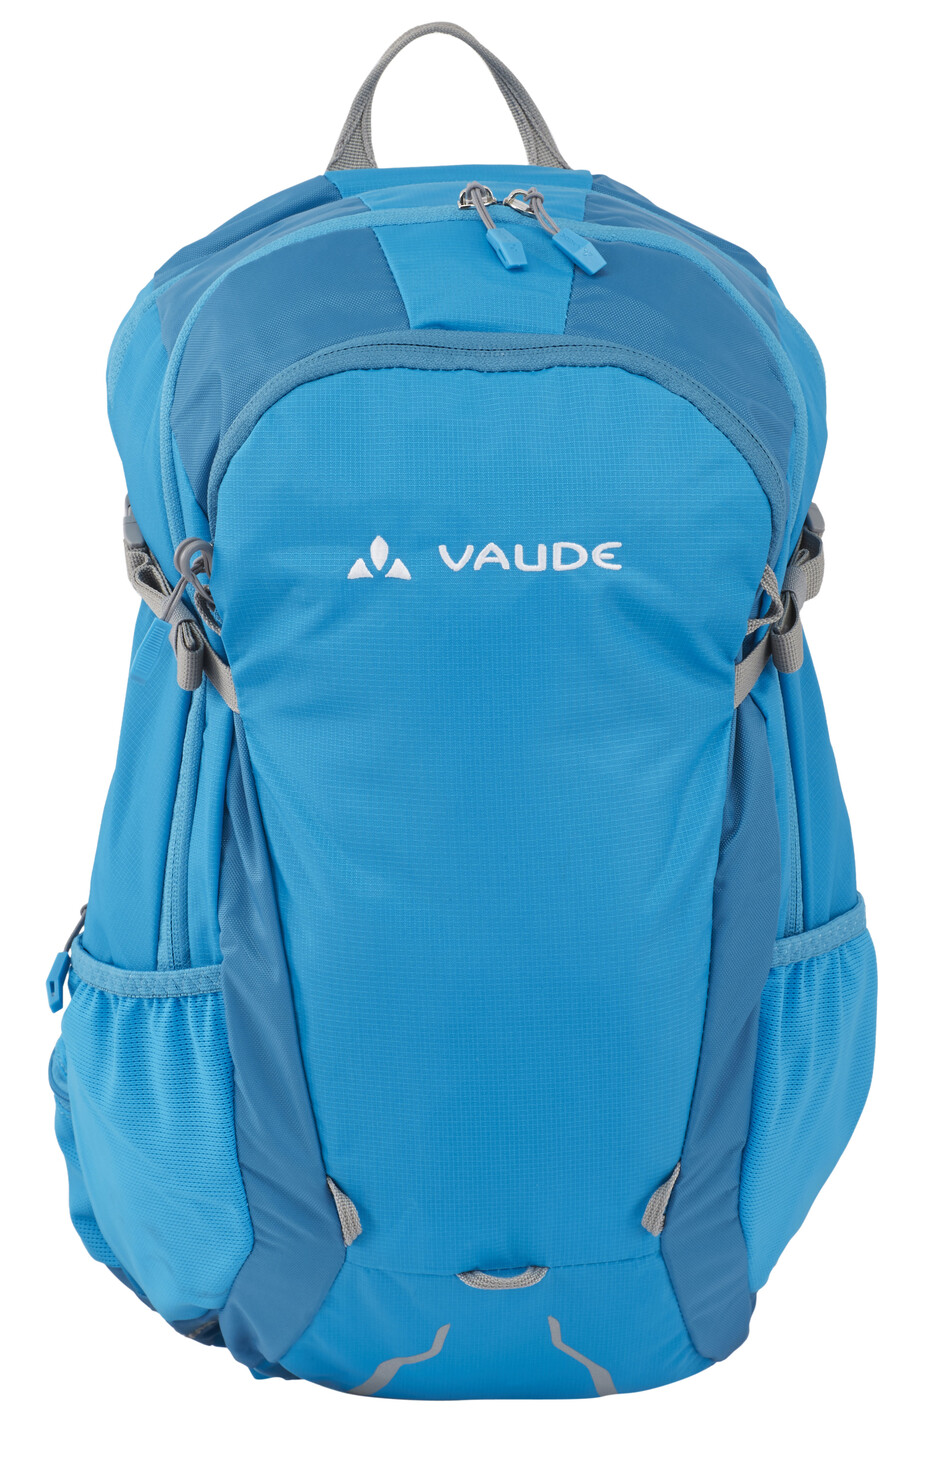 Vaude Roomy 17+3 Rucksack teal blue/seablue 42 x 26 x 18 frauen petrol 2015